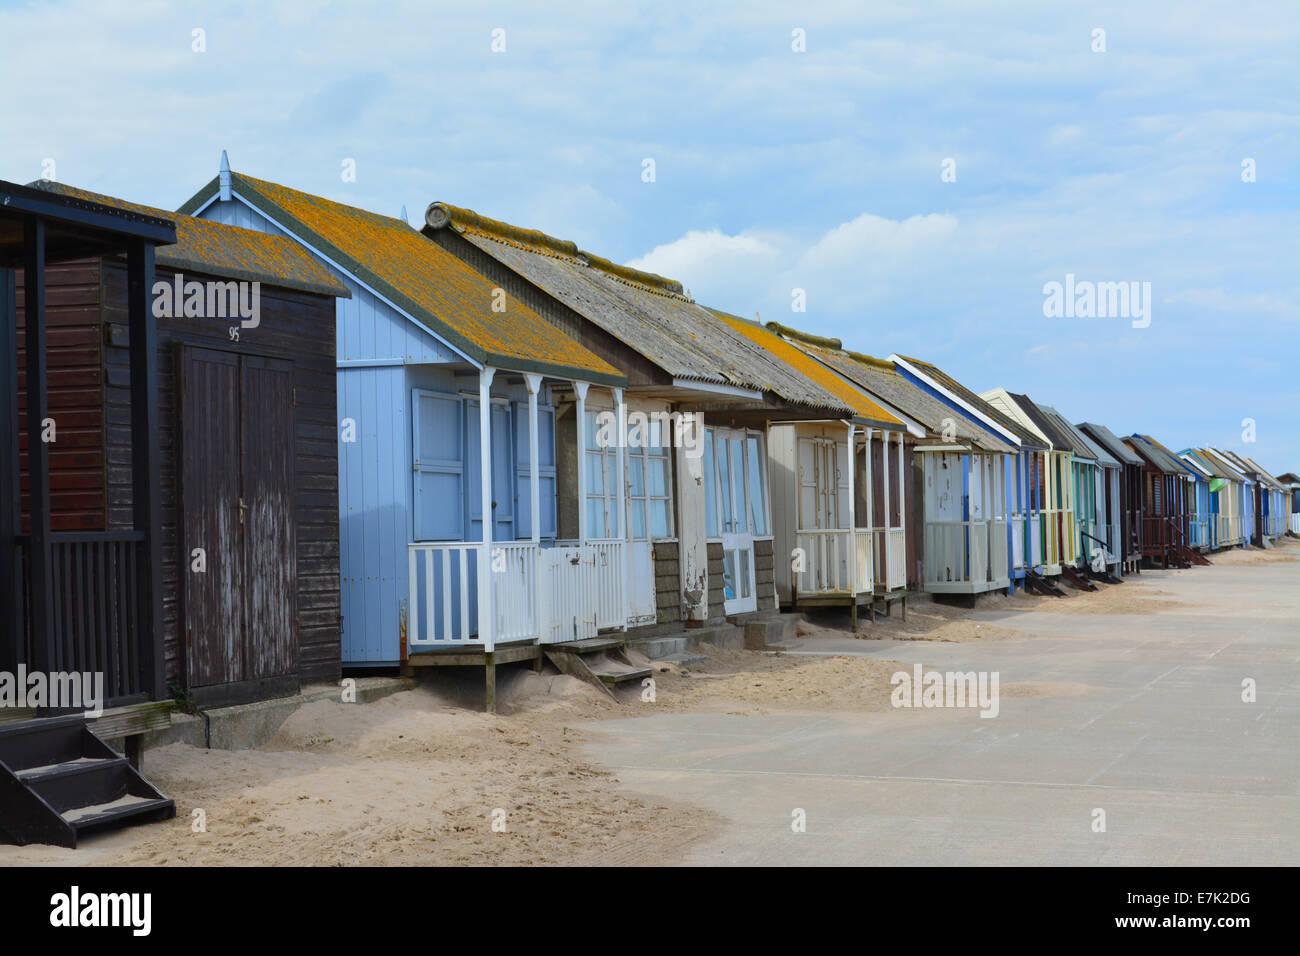 Beach Huts at Lincolnshire resort - Stock Image